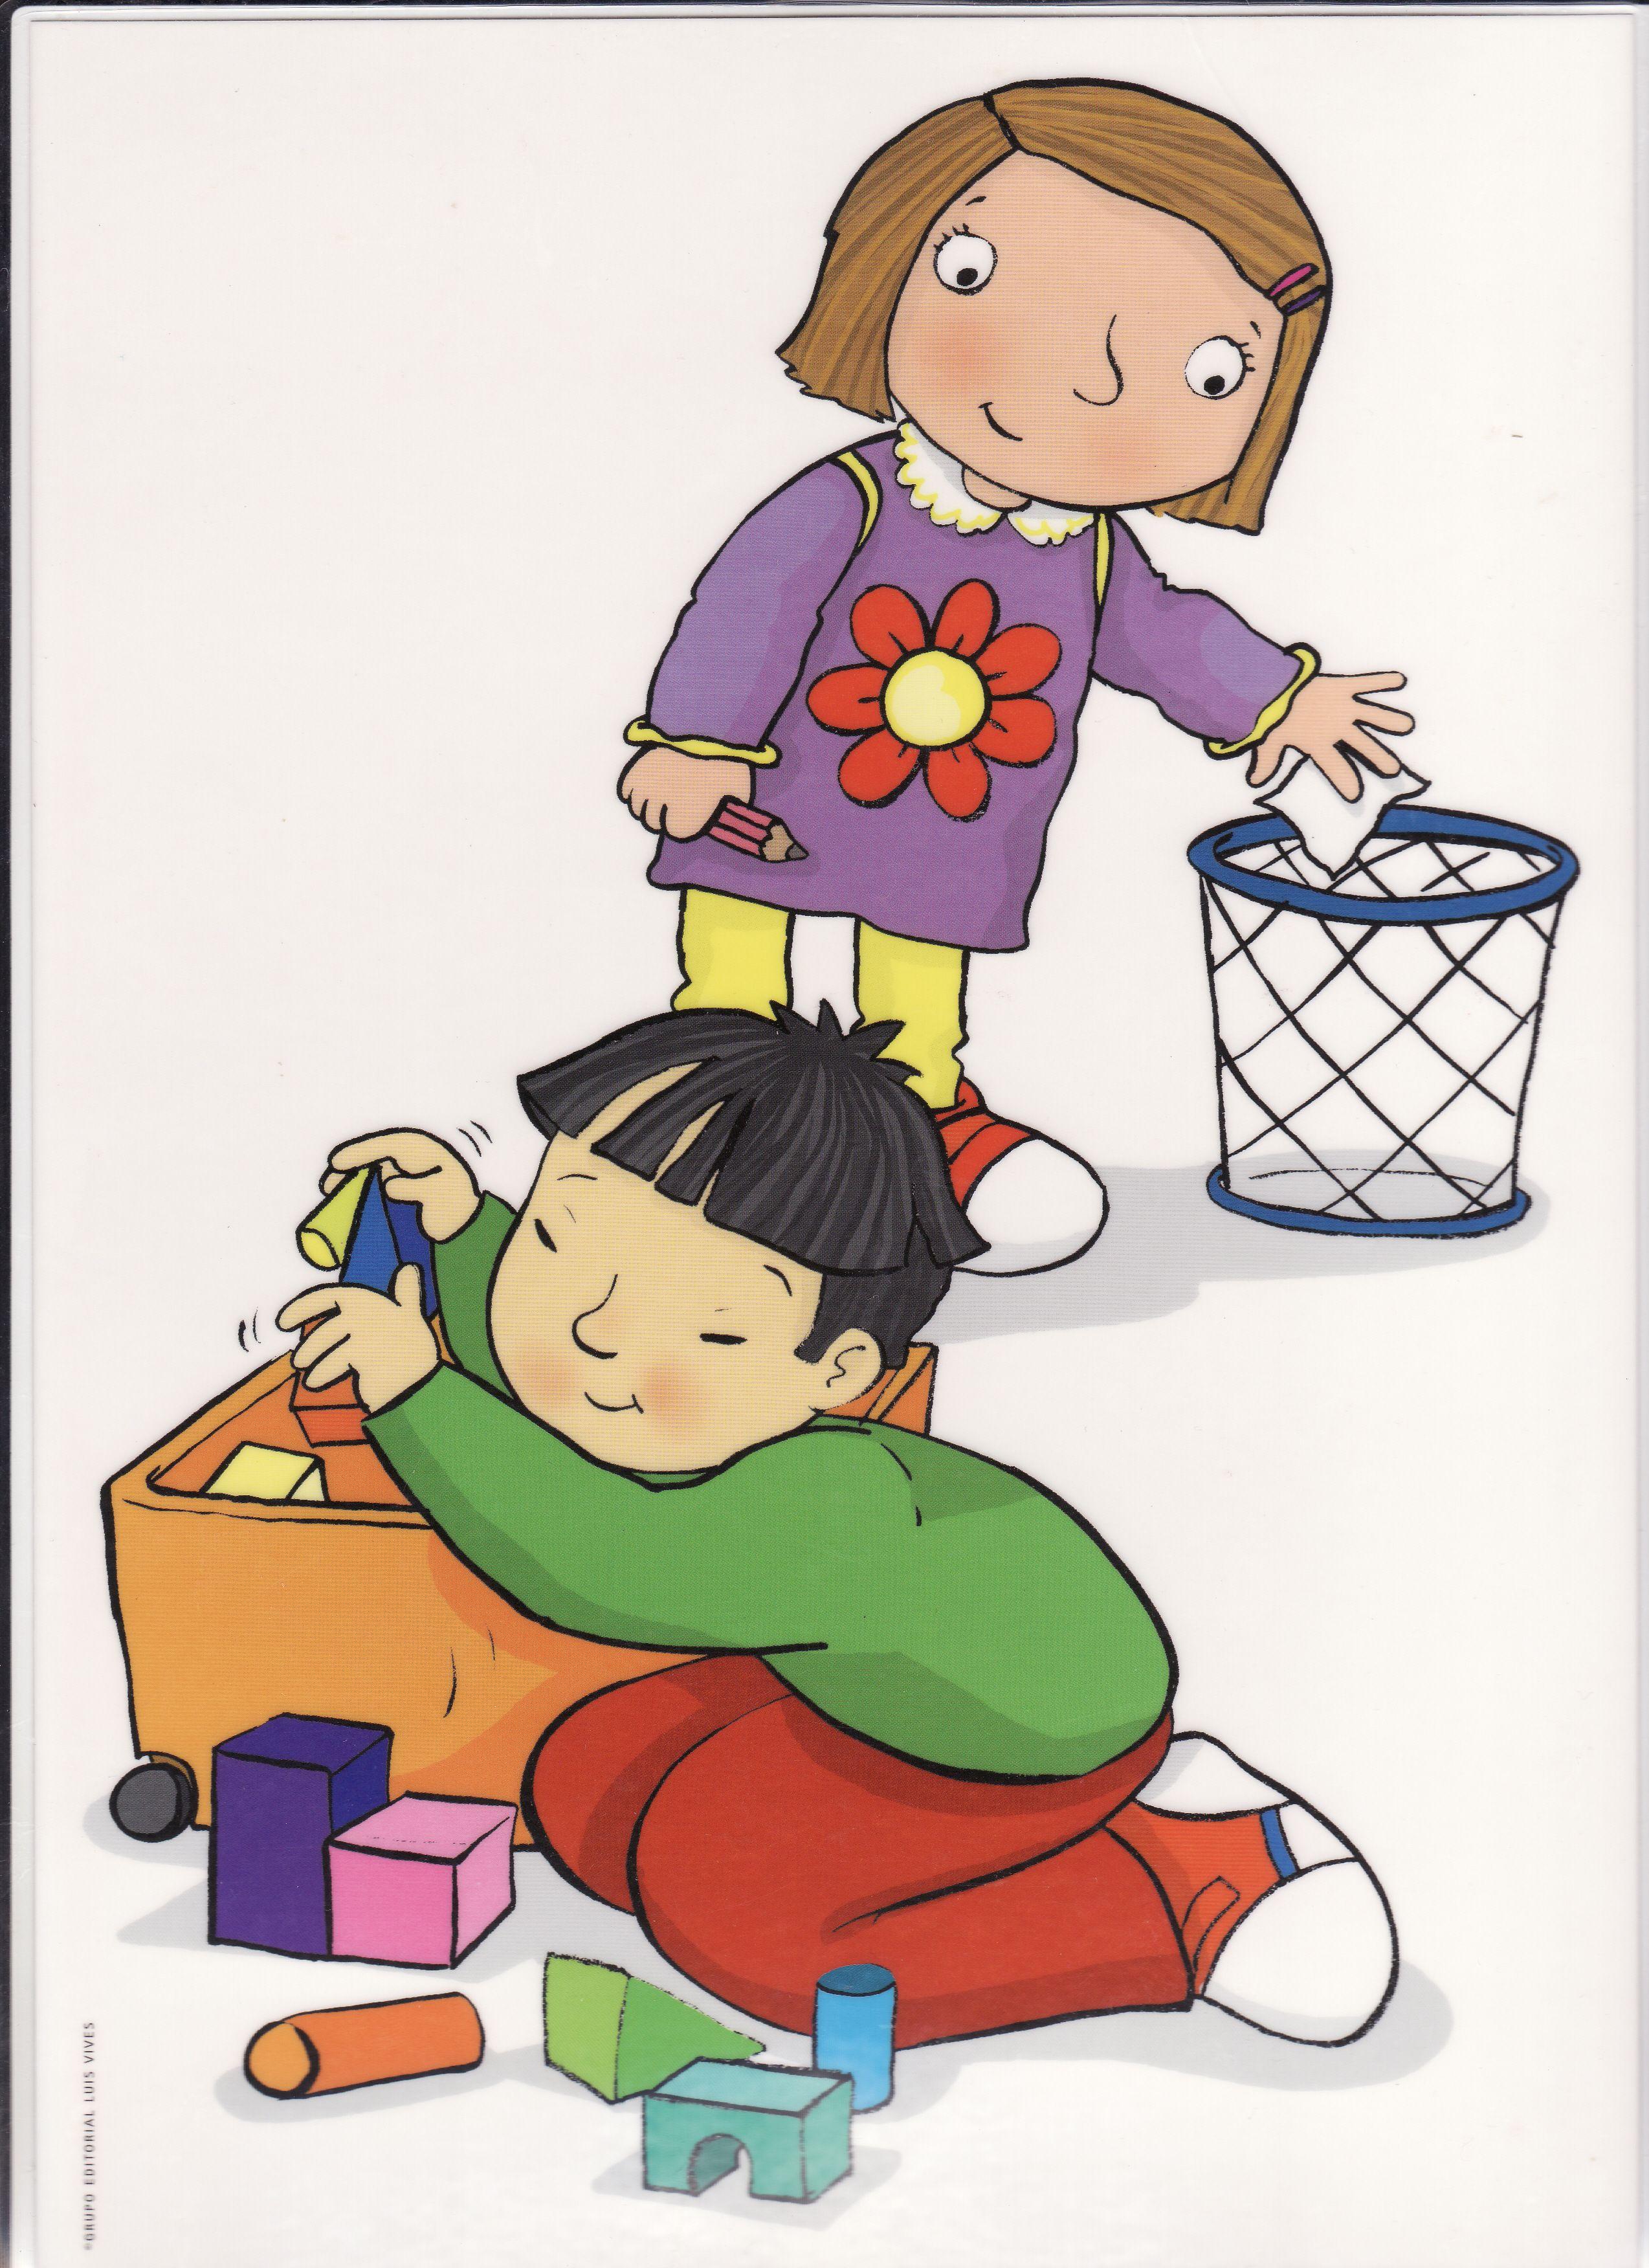 Ejercer responsabilidades en edades infantiles